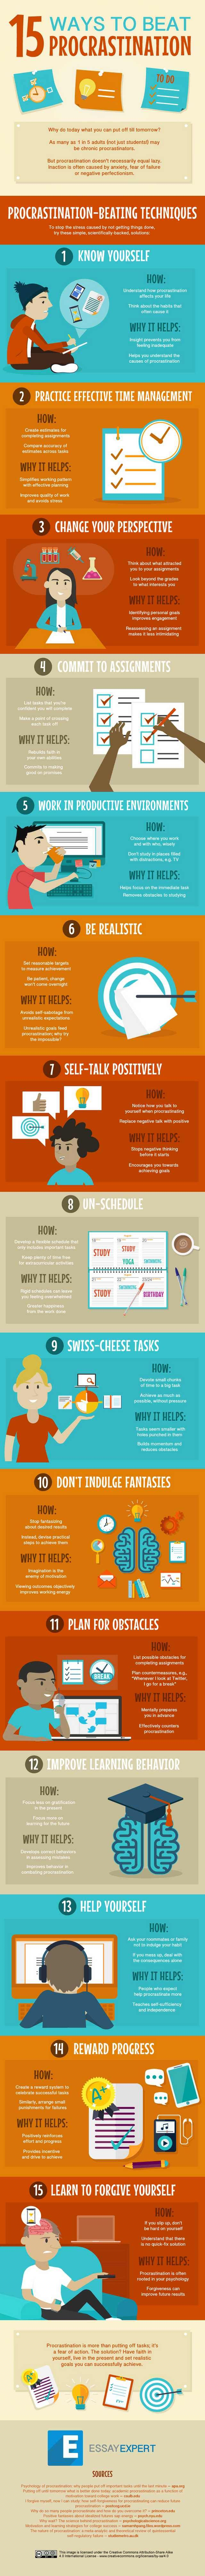 15 ways to beat procrastination - Imgur